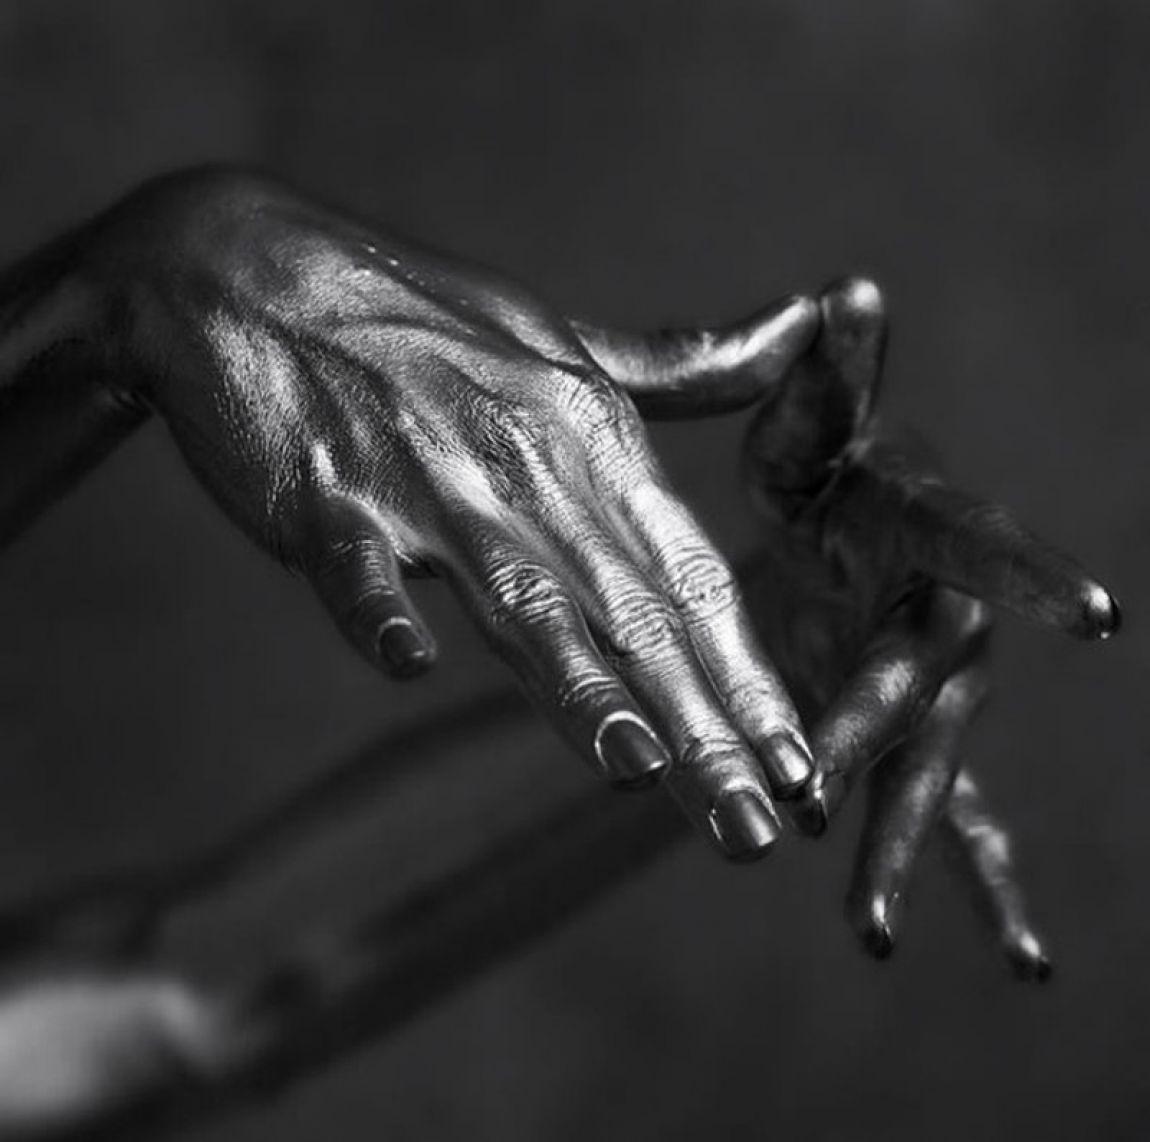 Скульптура голой девушки фото 1 фотография